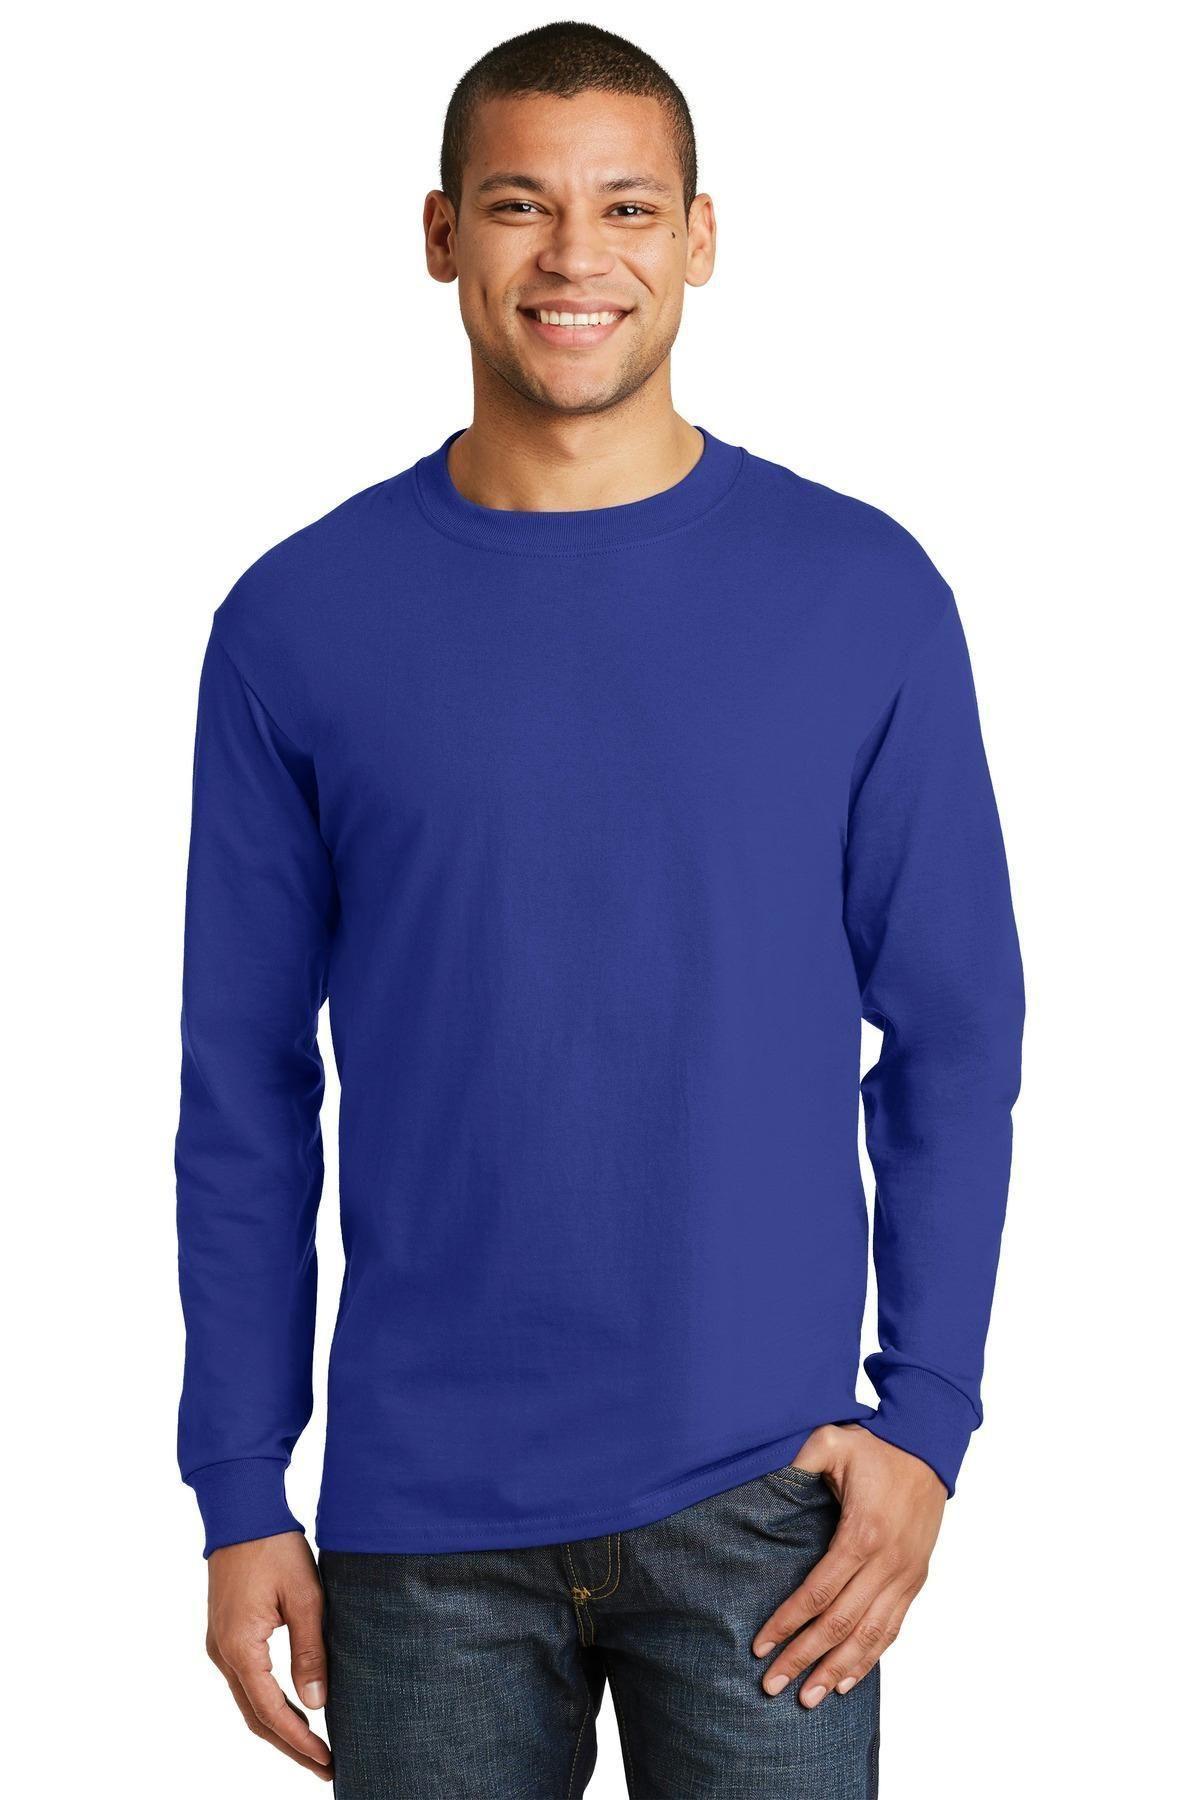 bc190d147 Hanes Mens Beefy Short Sleeve Pocket T Shirt – EDGE Engineering and ...